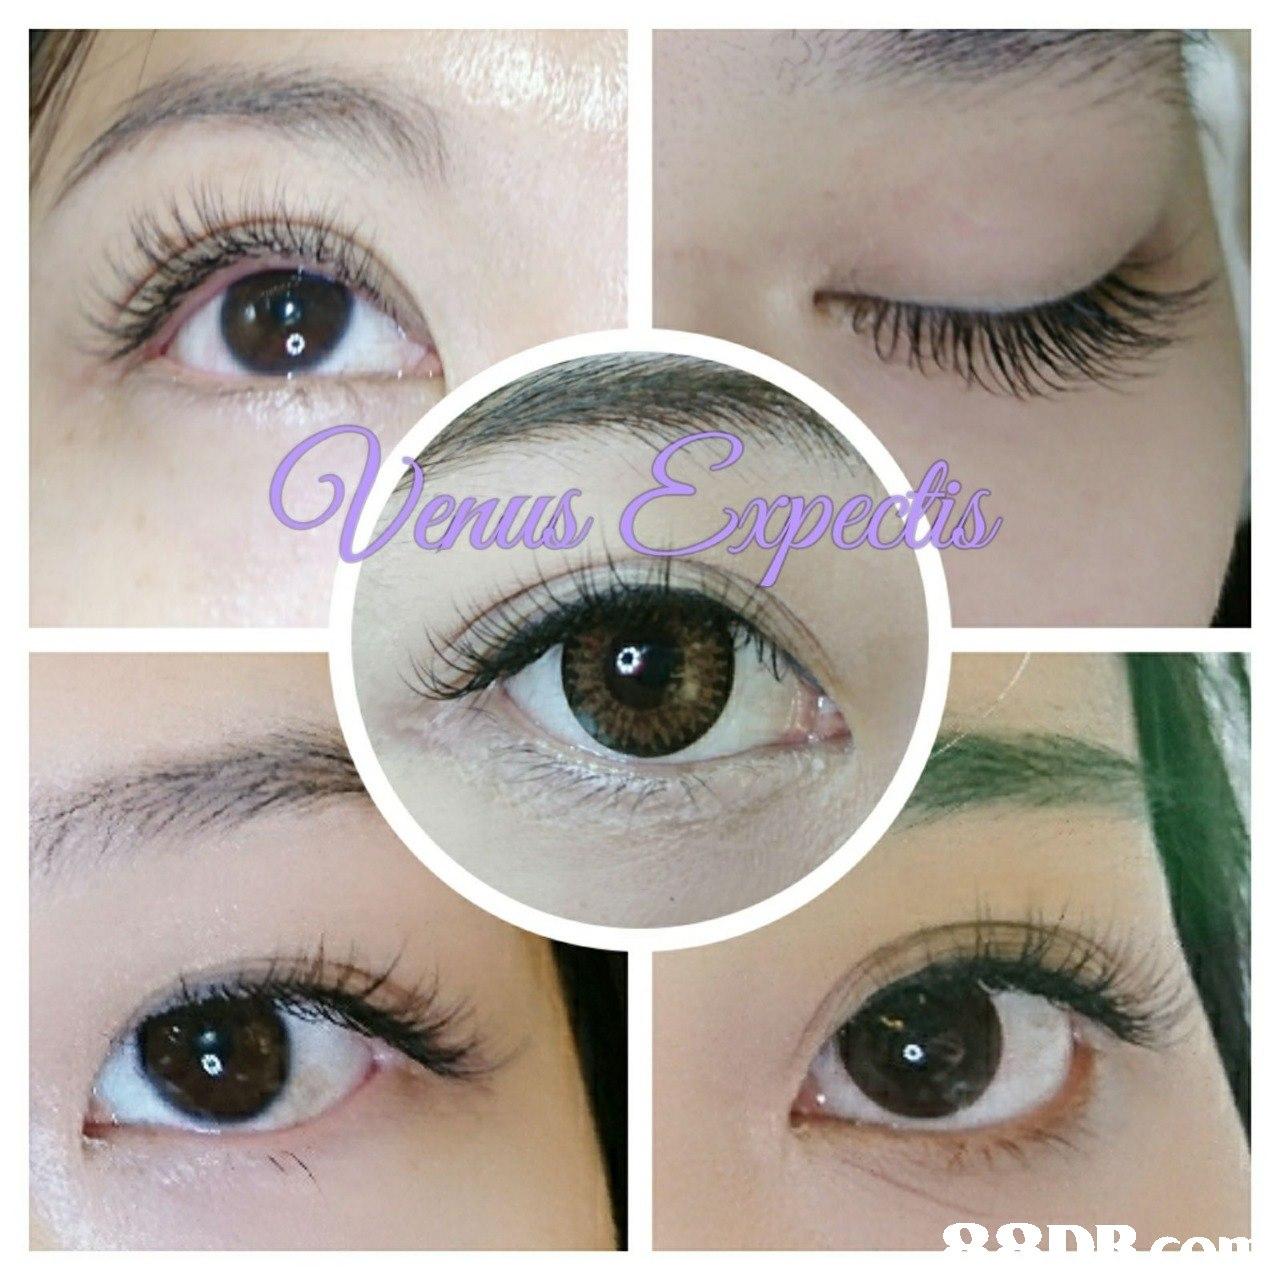 eyebrow,eyelash,eye,cosmetics,eye shadow